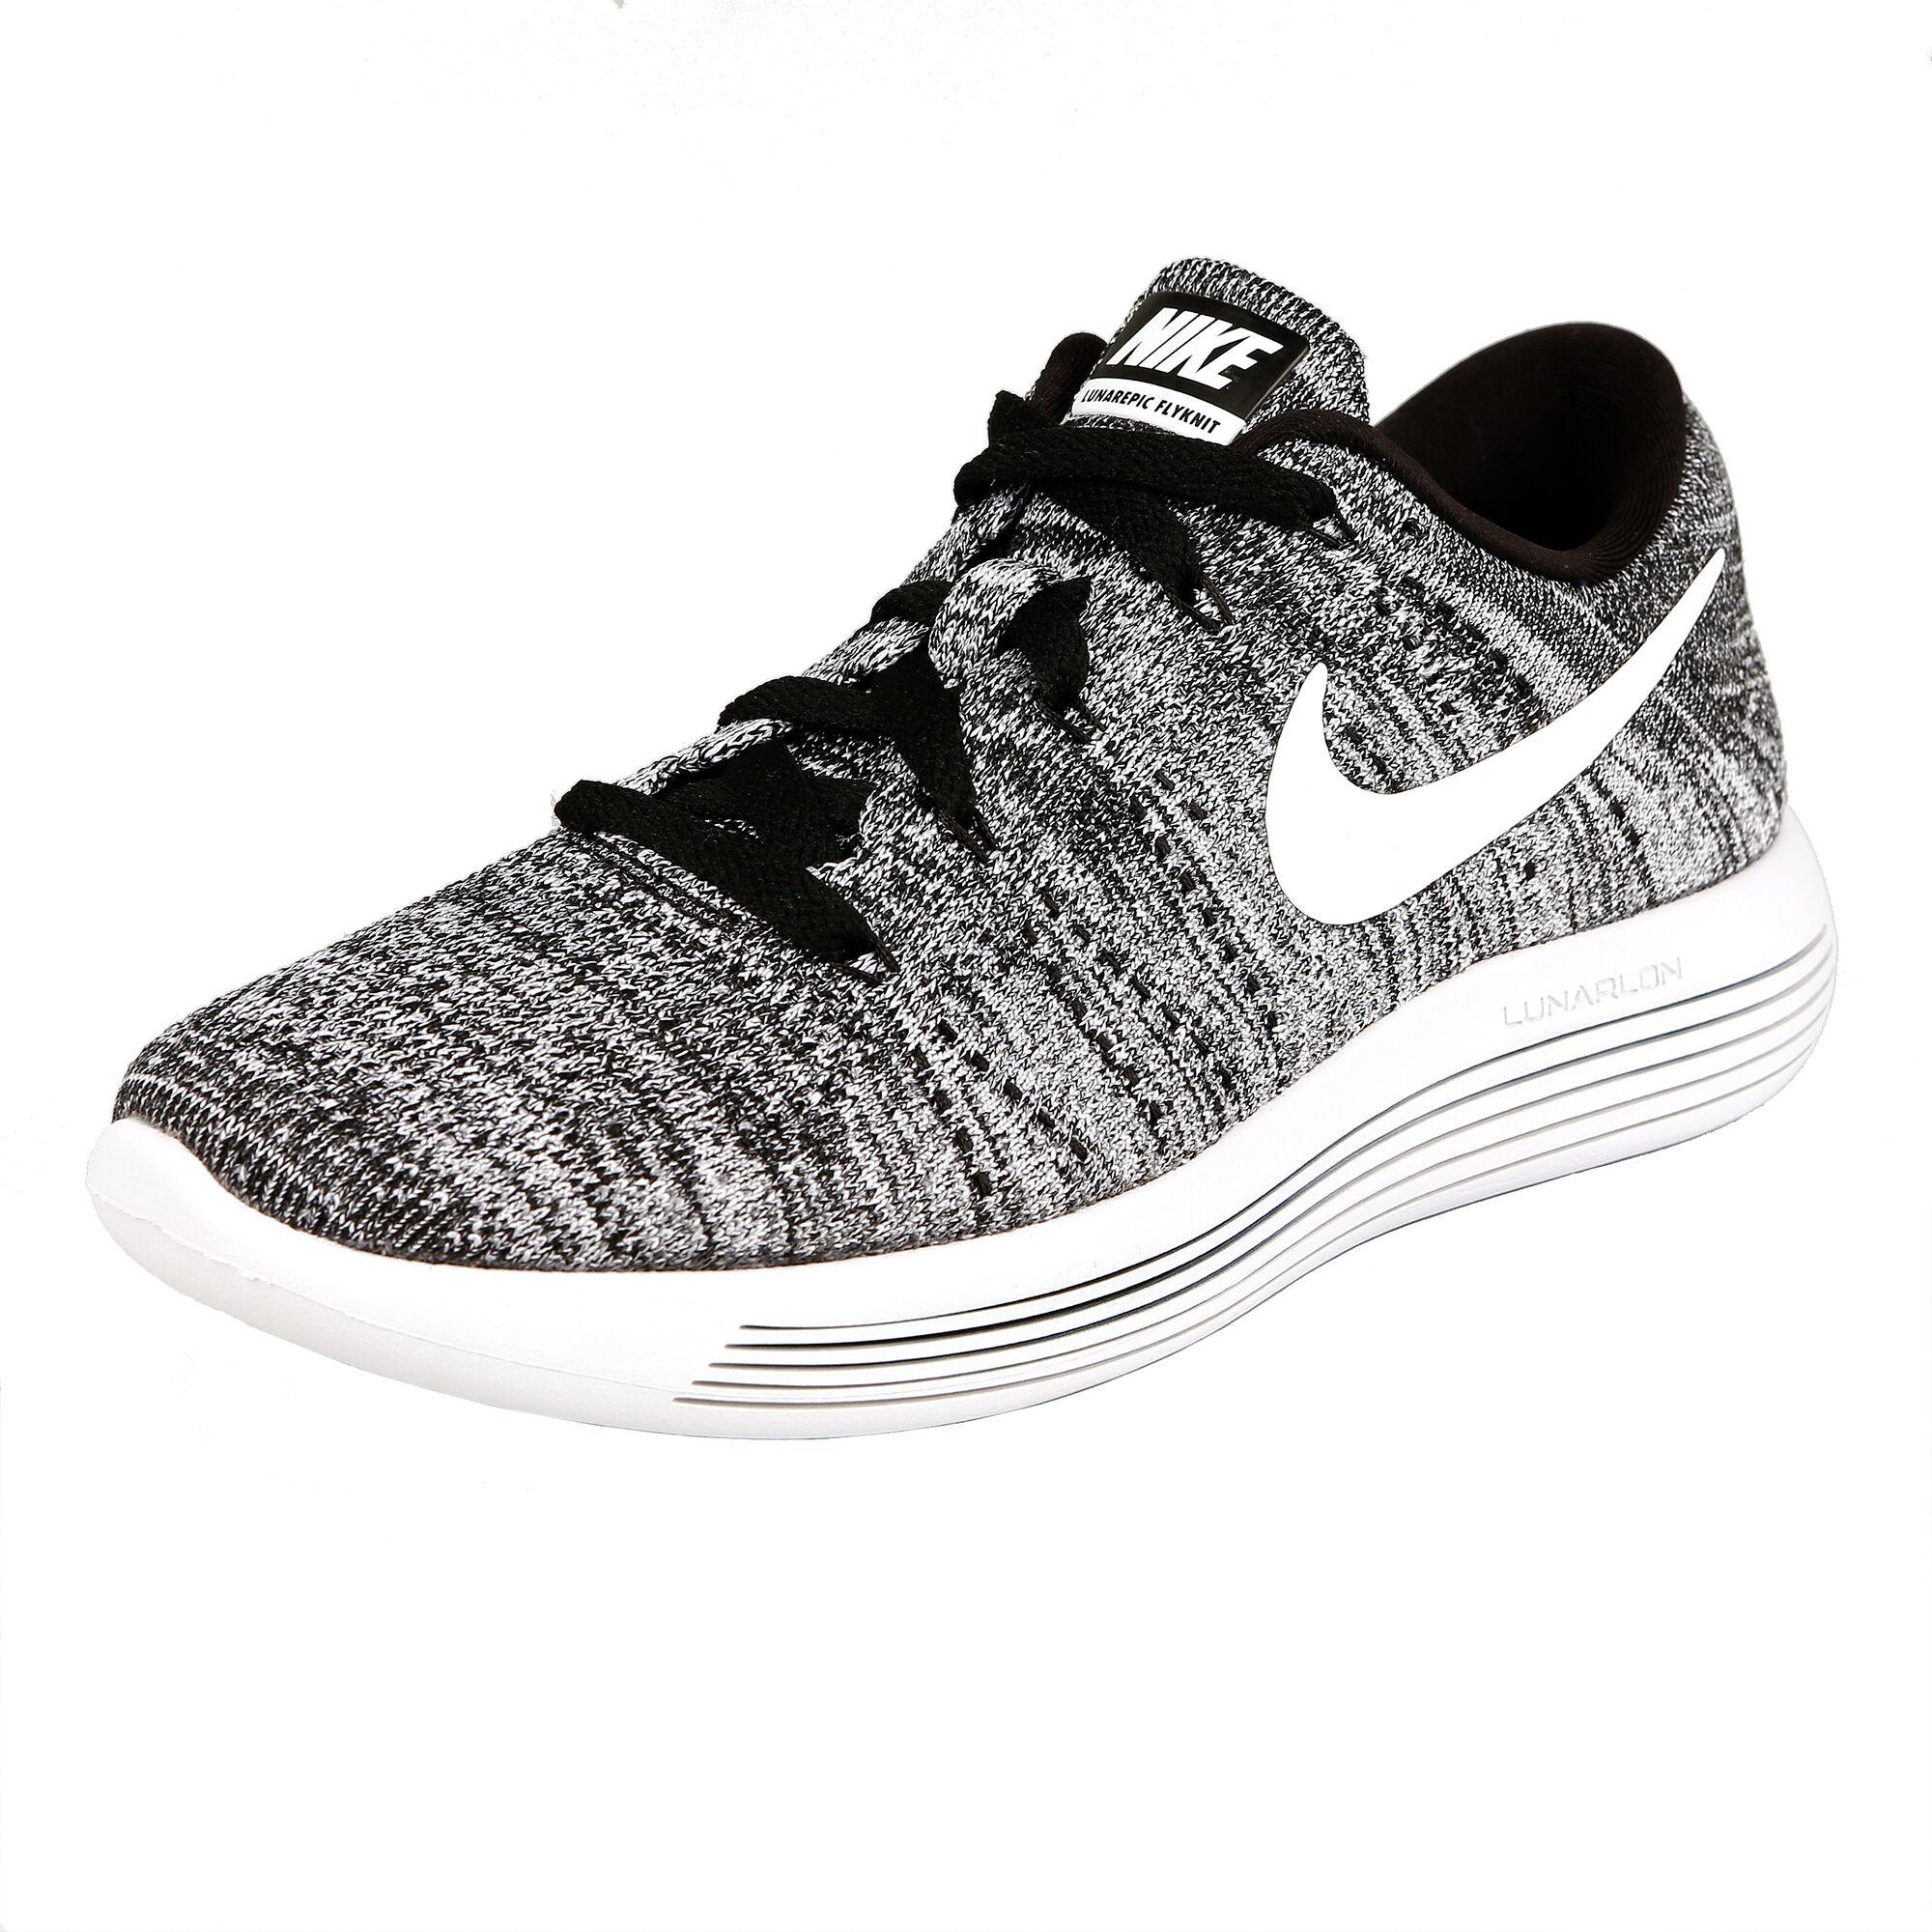 quality design 1ce6a e3a58 Nike  Nike  Nike  Nike  Nike. Nike LunarEpic Low Flyknit ...